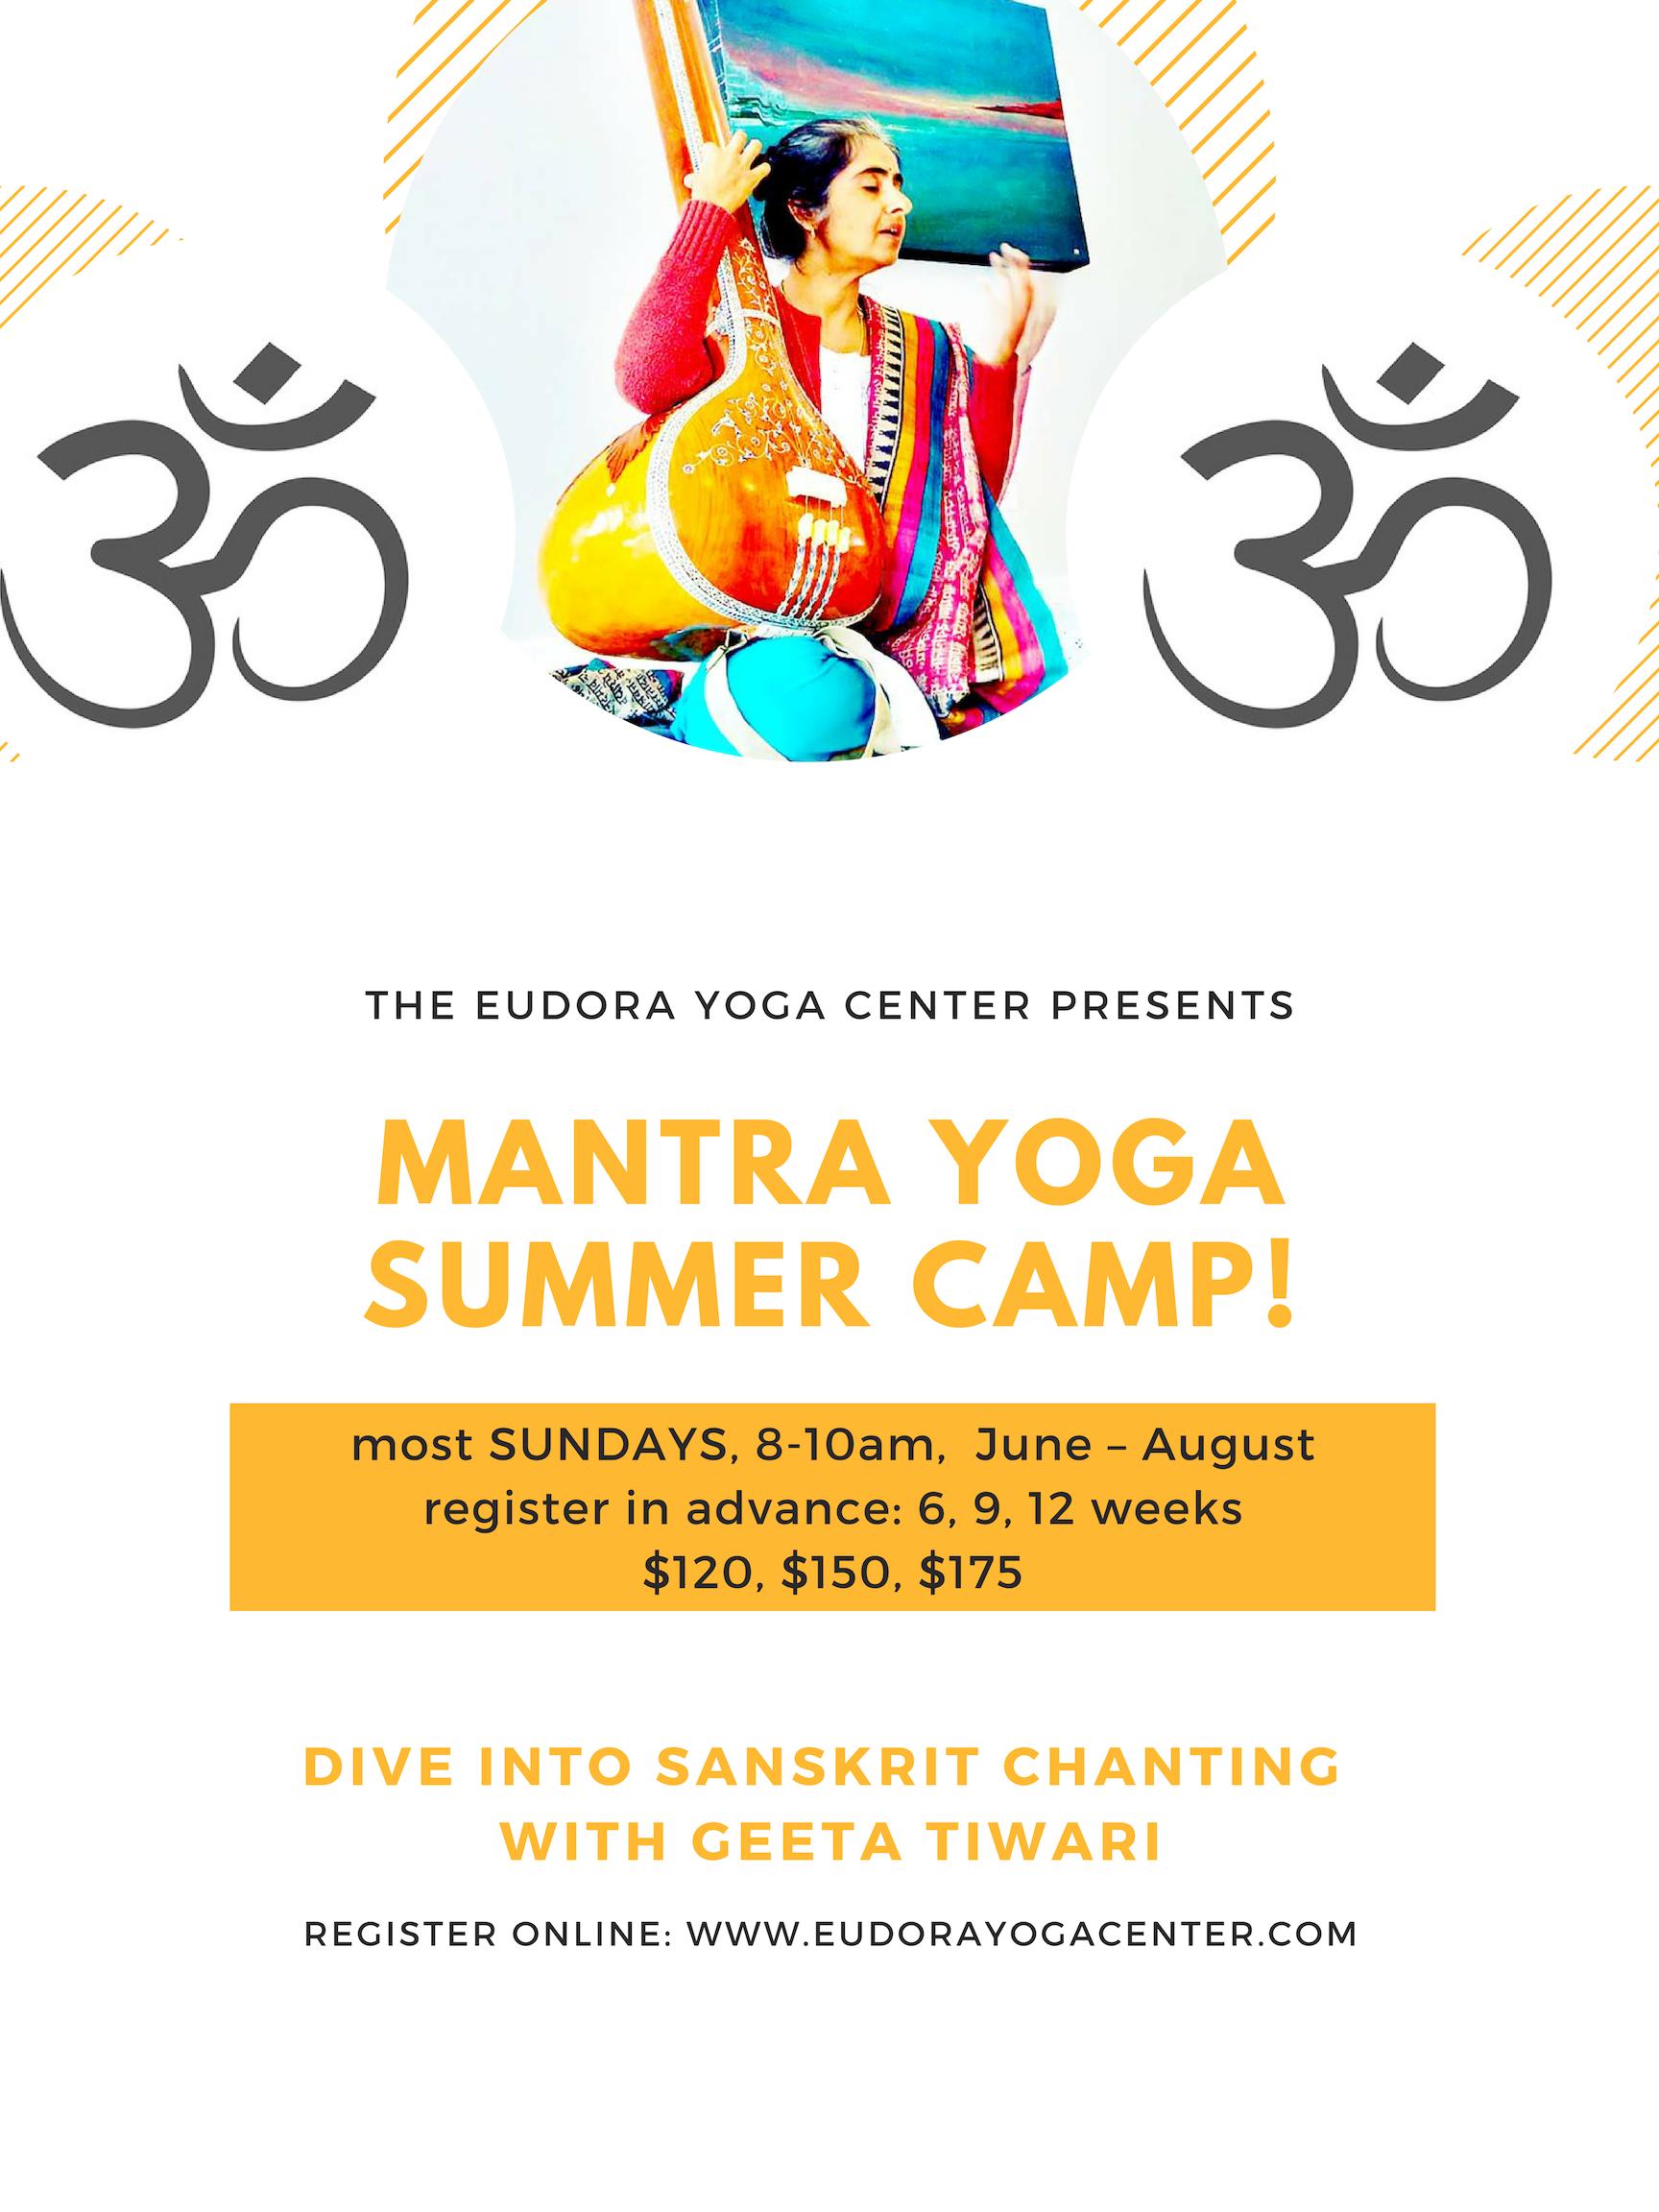 Mantra Yoga Summer Camp